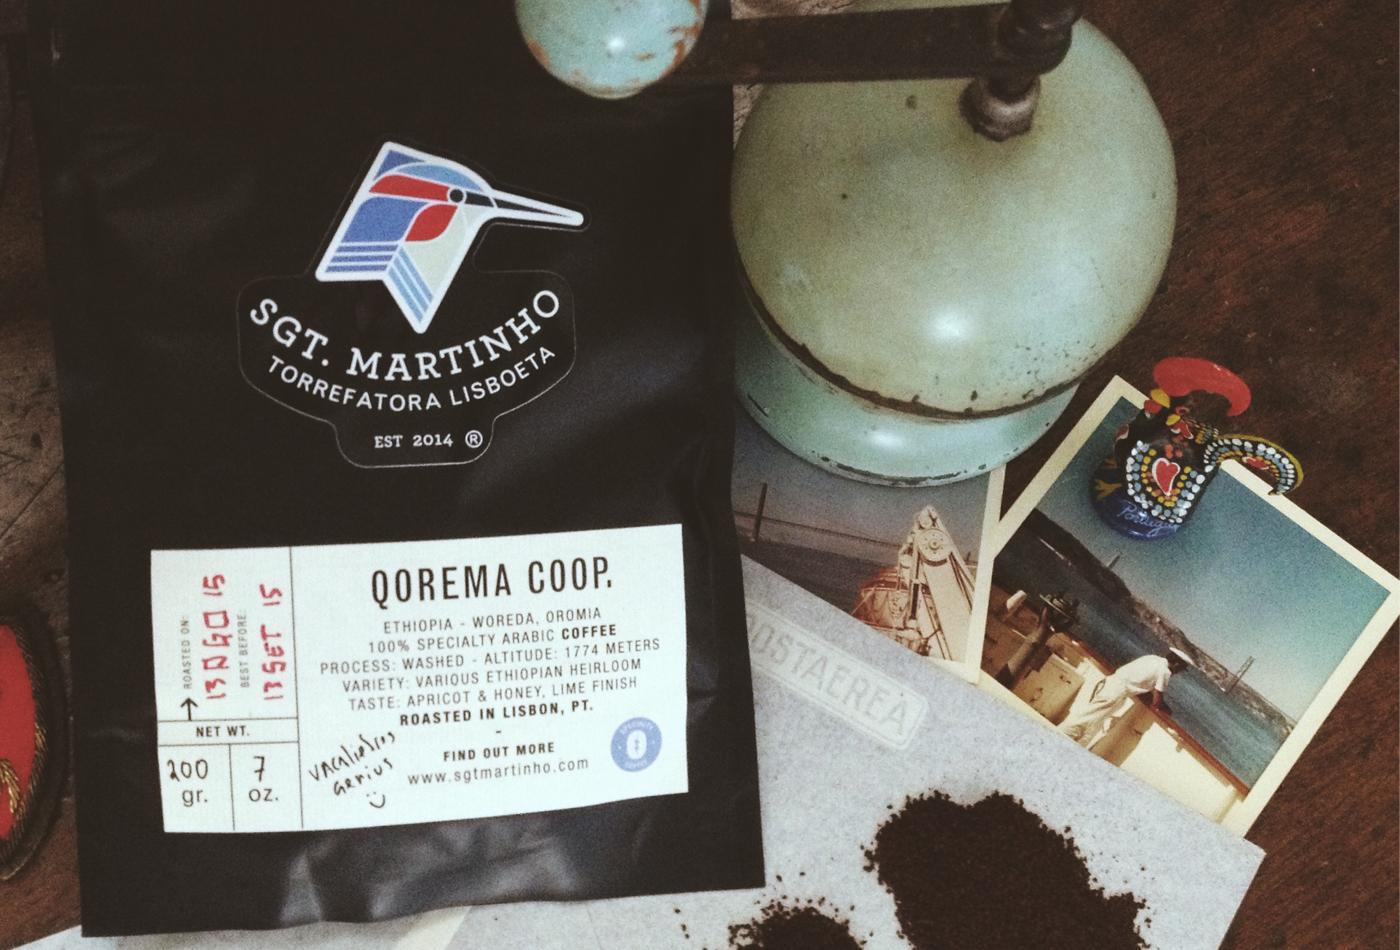 09-sargento-sergeant-martinho-coffee-brand-marks-branding-logo-vacaliebres